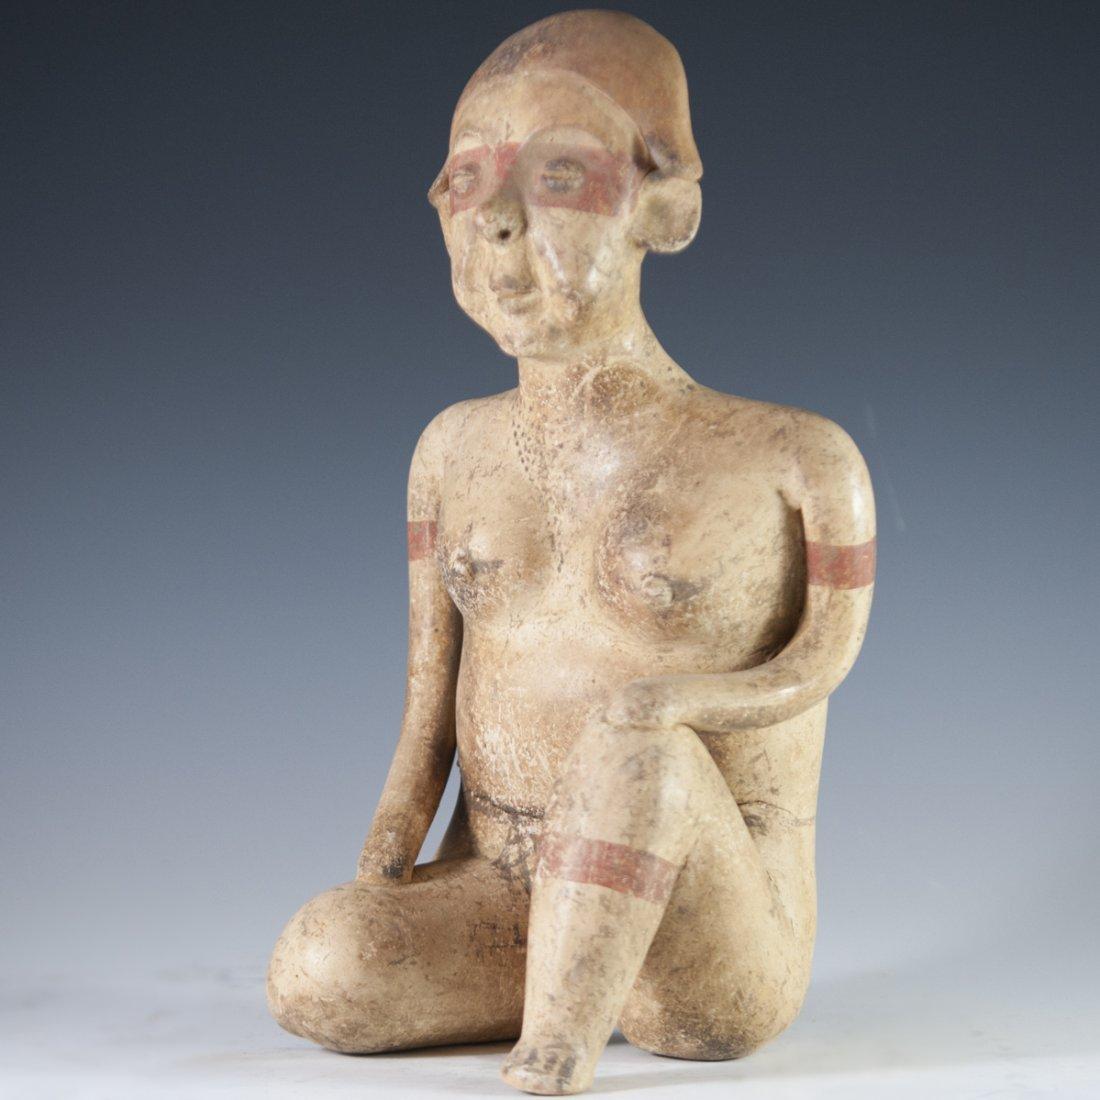 Probably Pre-Columbian Mayan Figurine